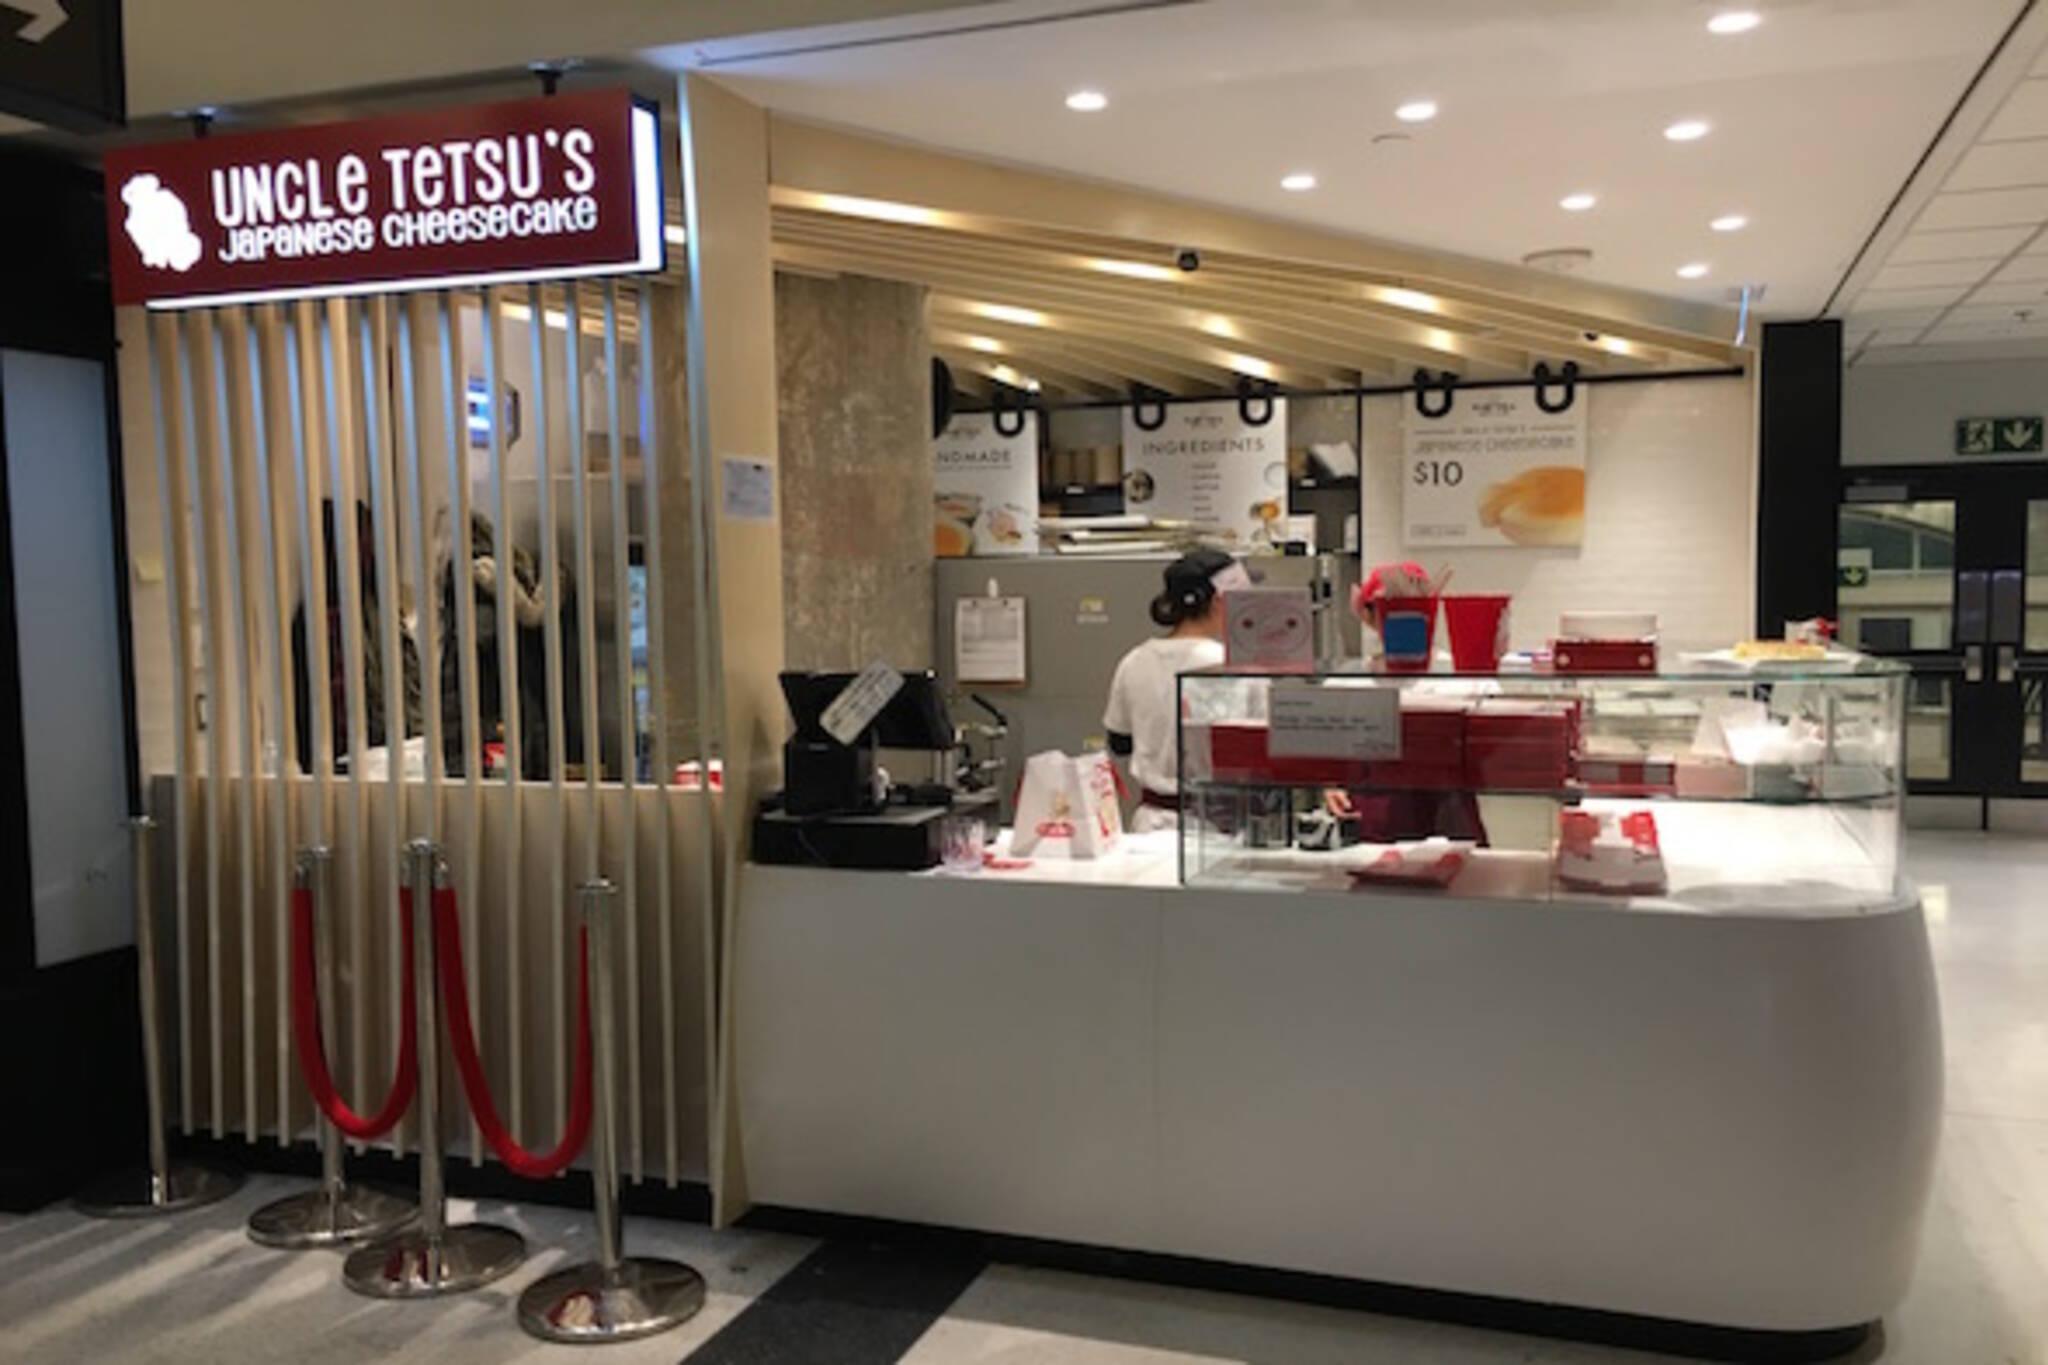 Uncle Tetsus Japanese Cheesecake Union Station